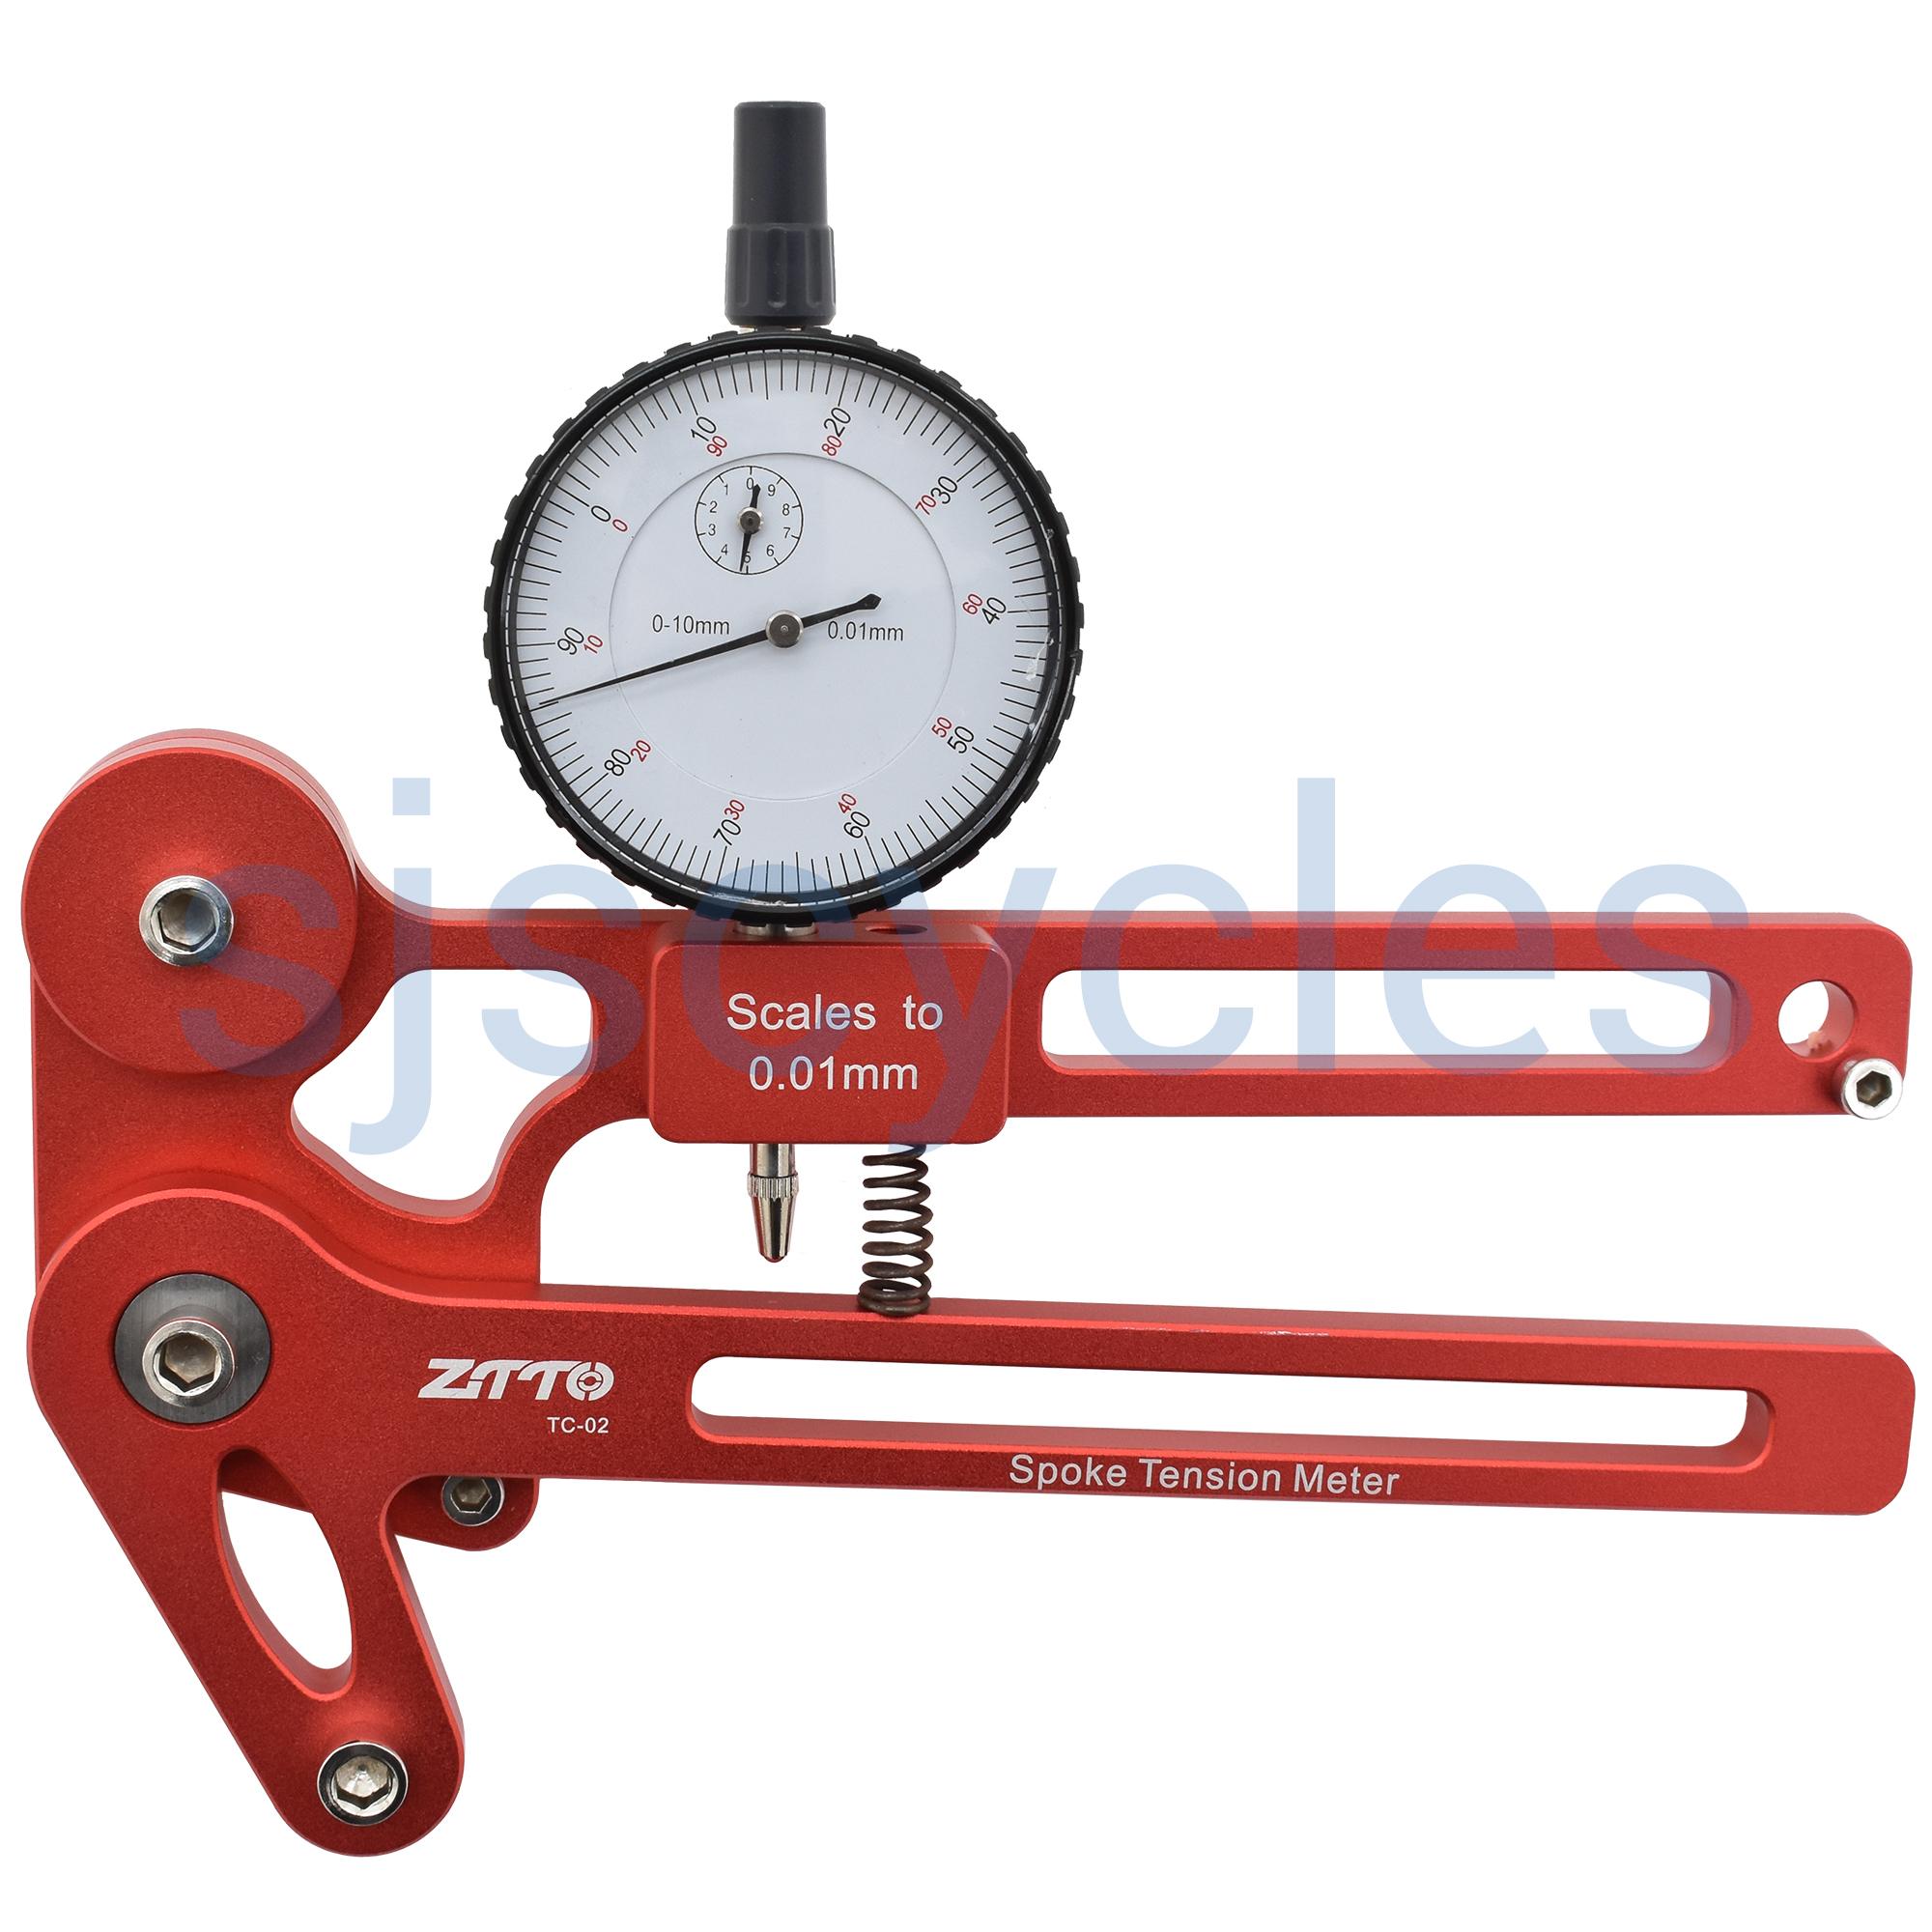 ZTTO Cycle Bicycle Spoke Tension Meter Wheel Steel Ring Correction Gauge Tool hs